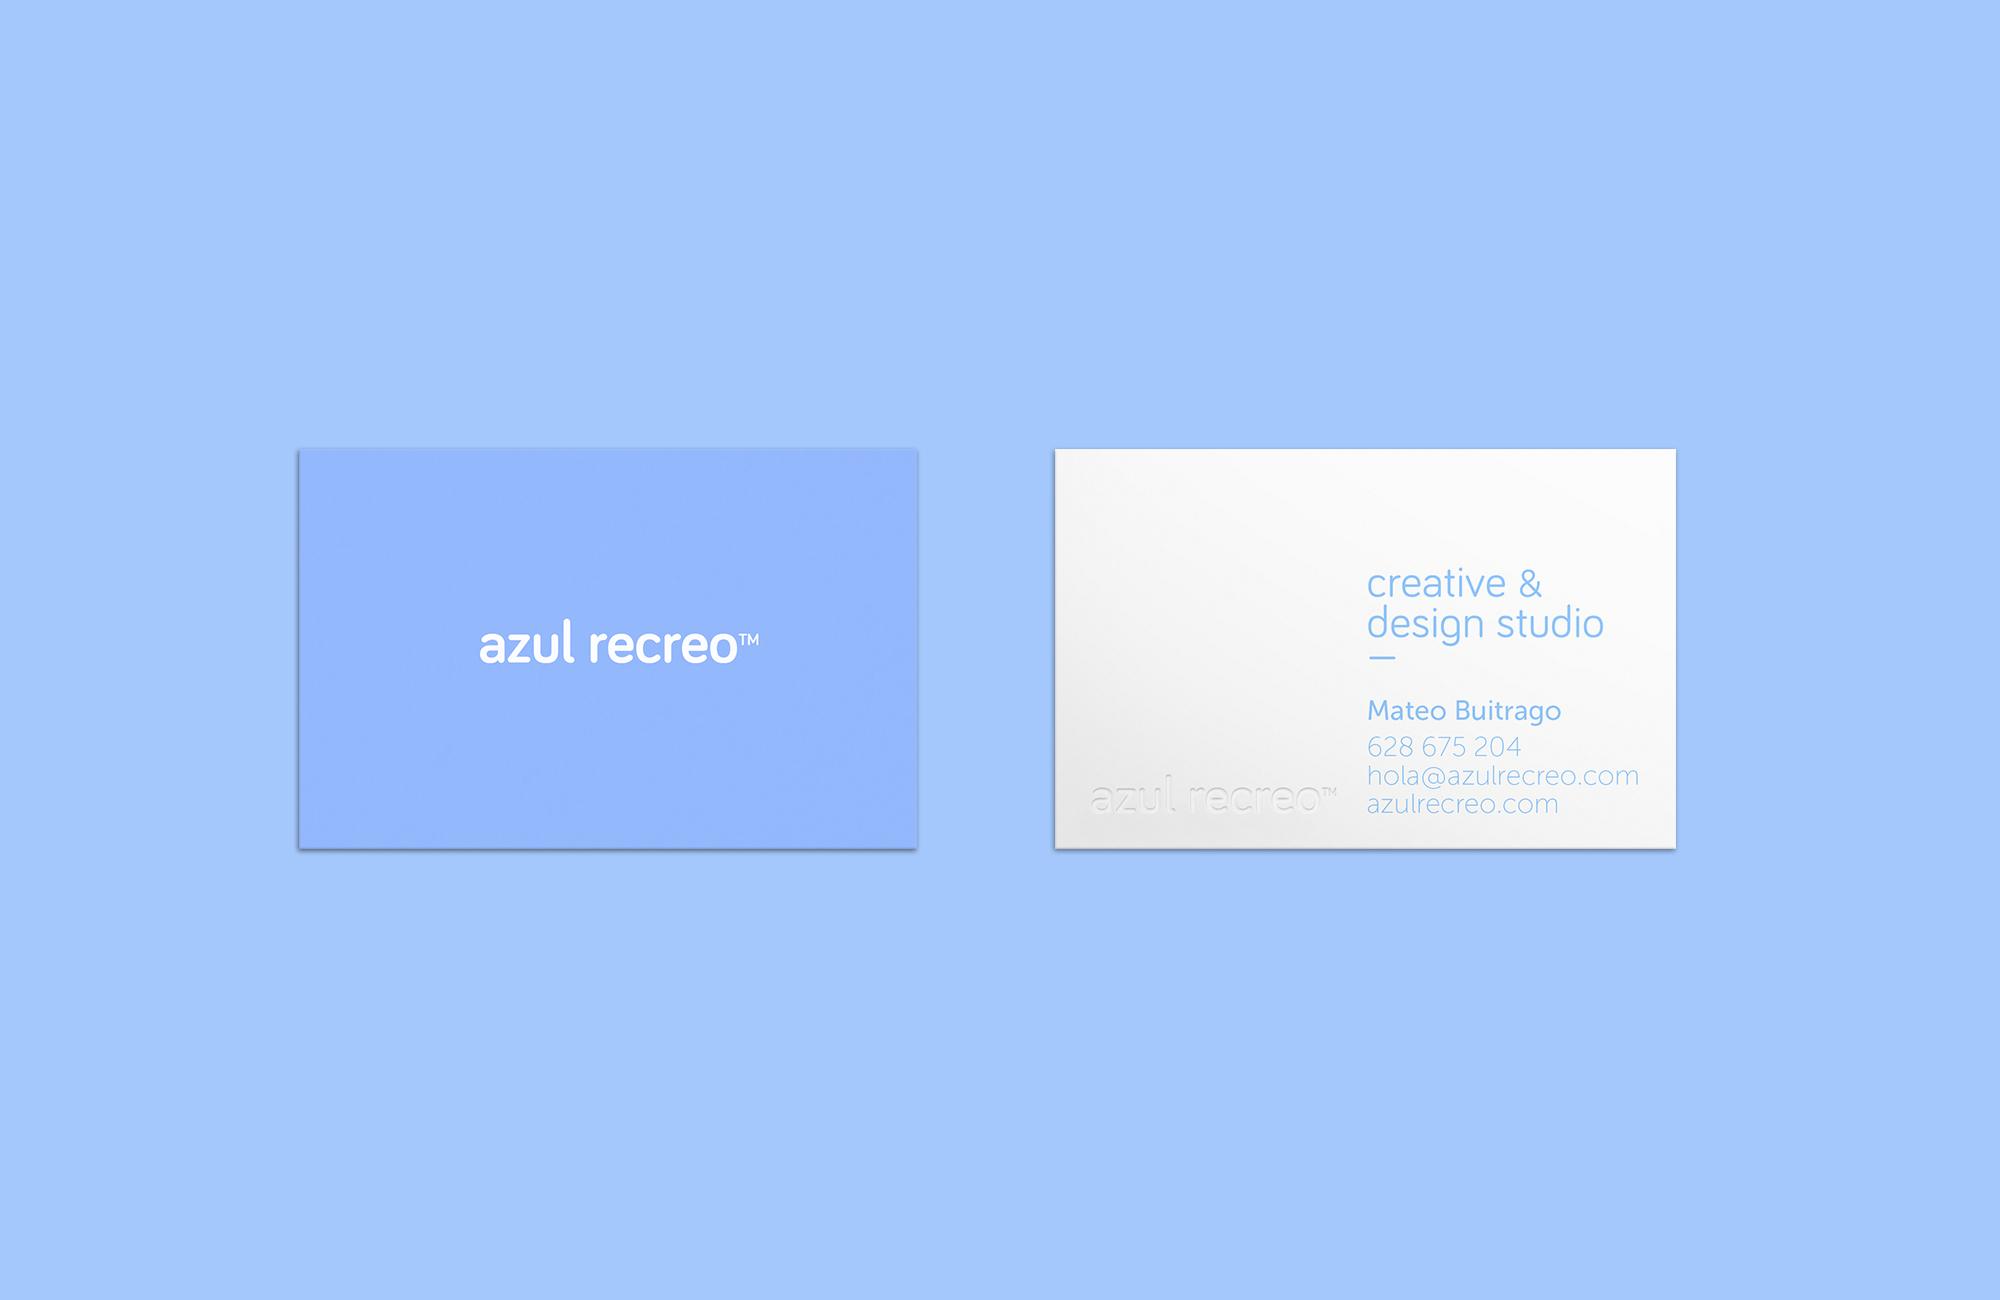 azulrecreo_tarjeta-m